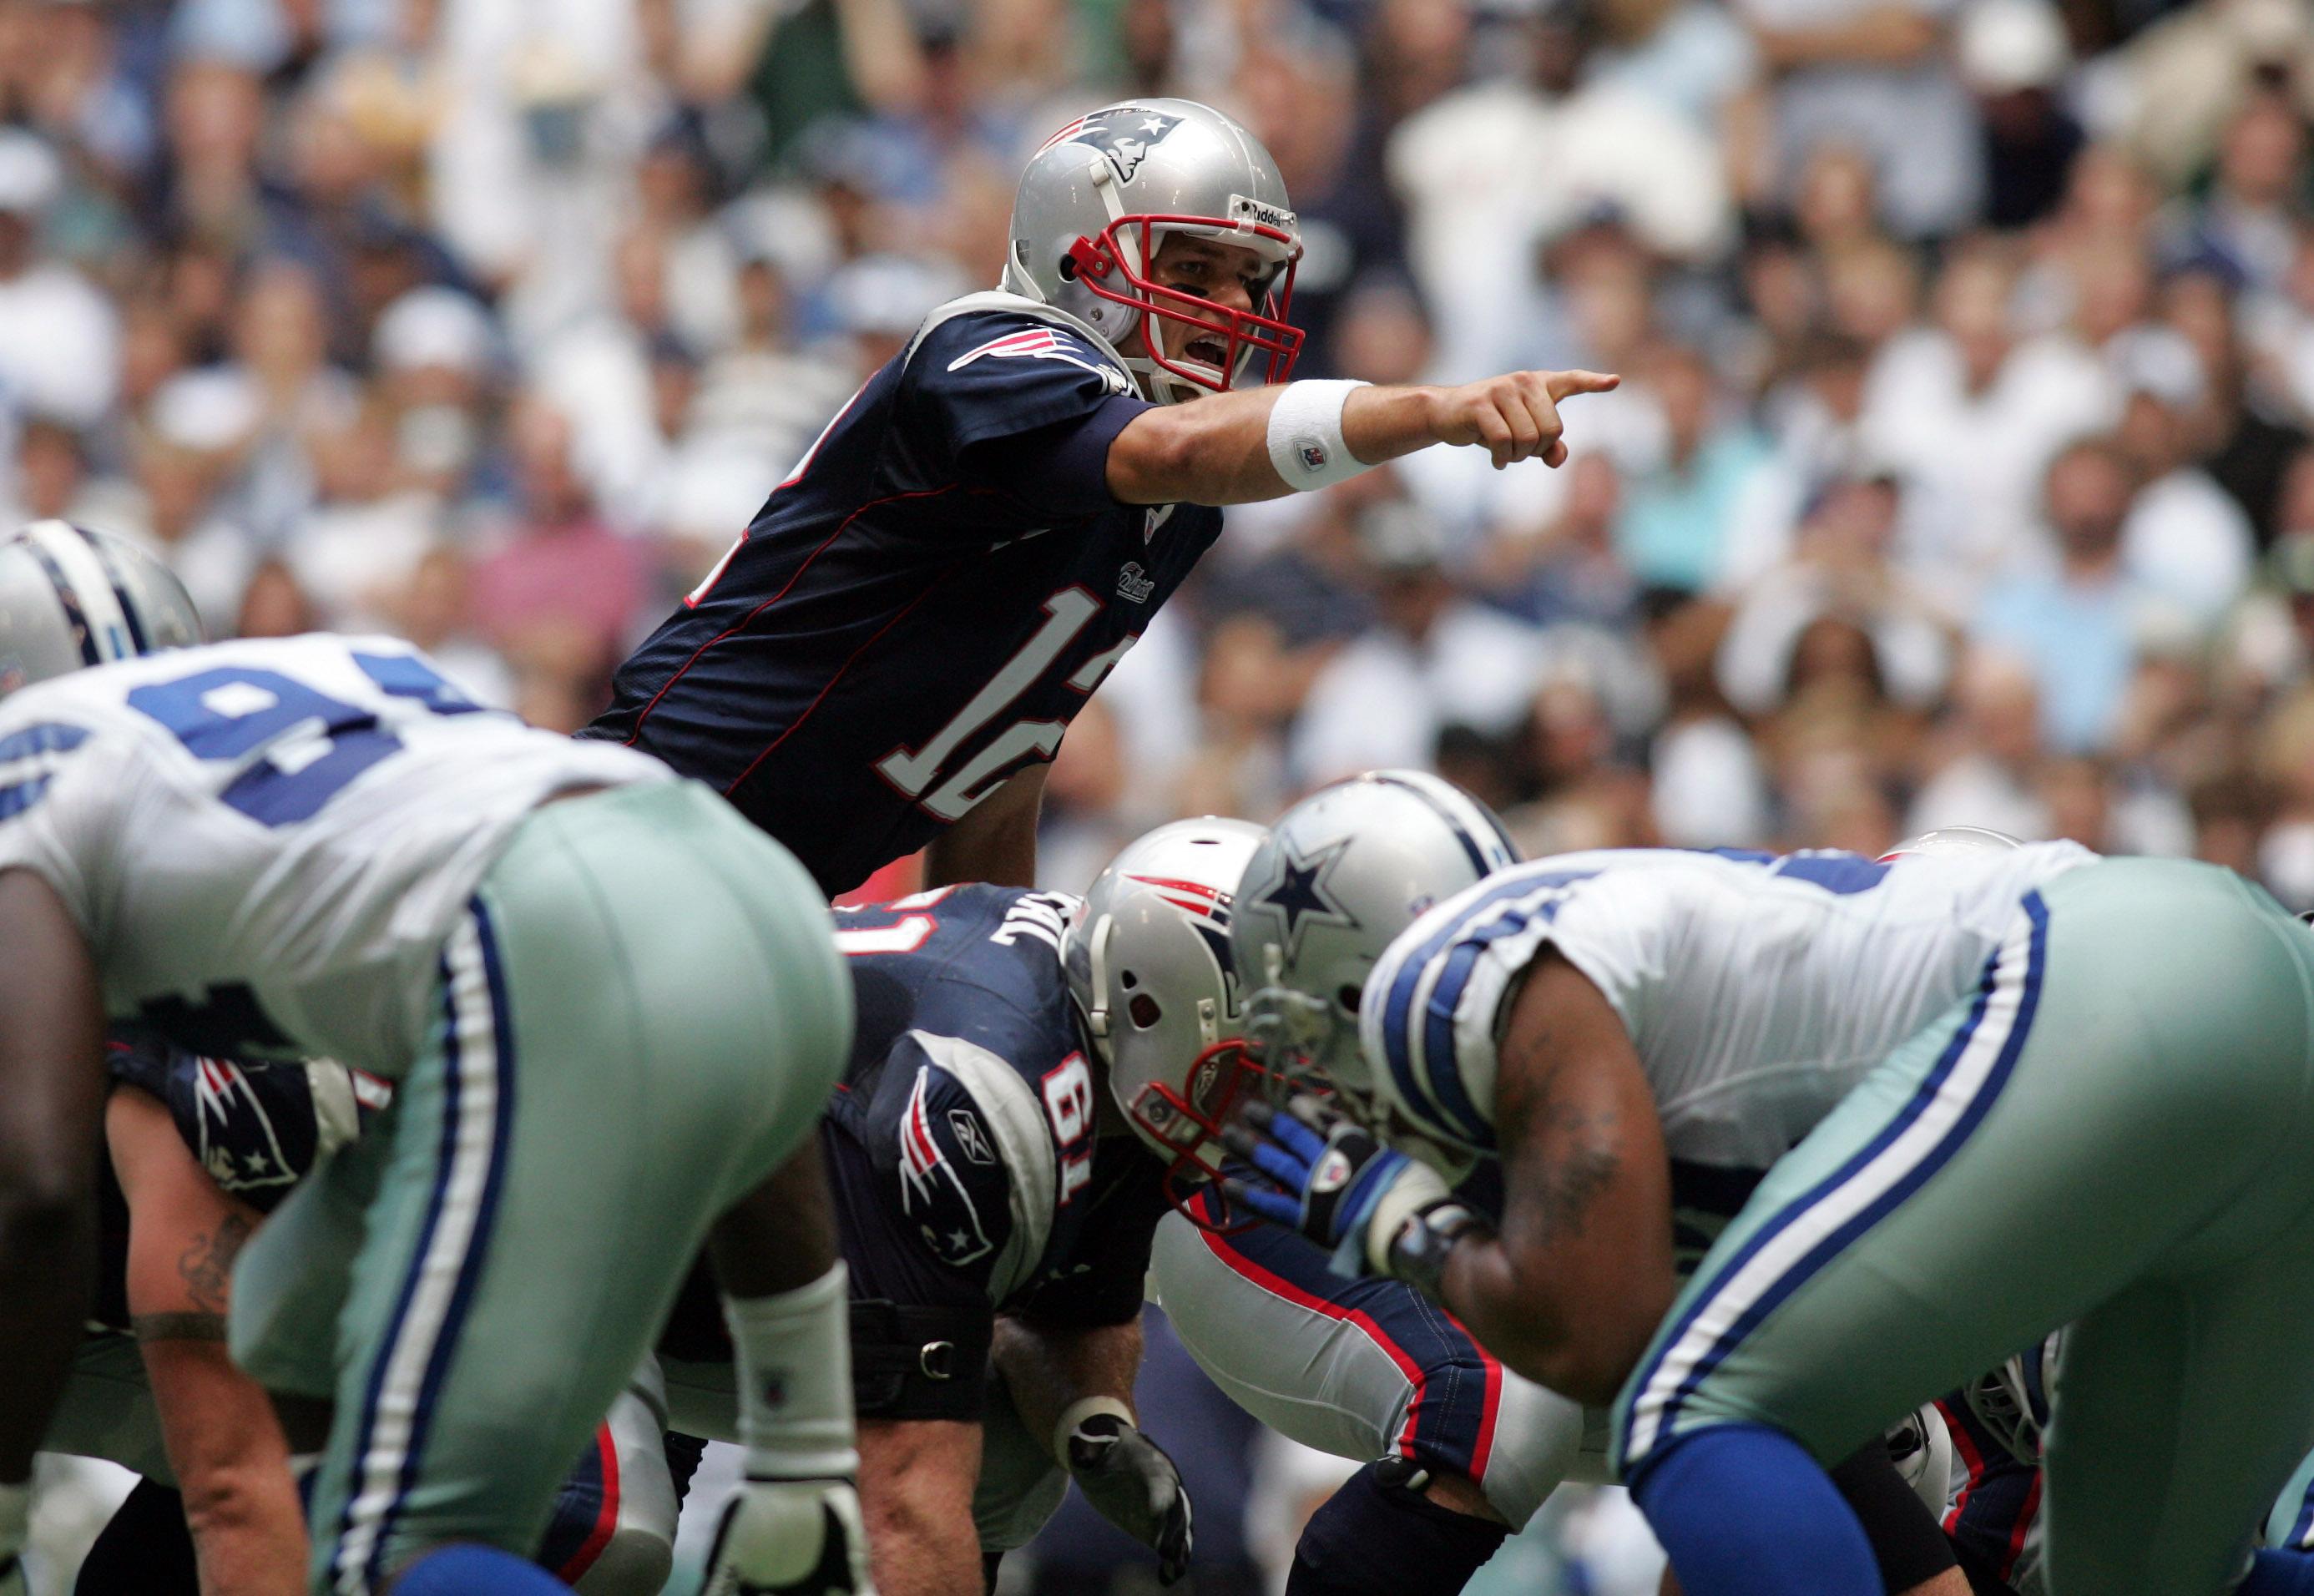 Patriots QB Tom Brady threw 5 TD passes the last time he played in Dallas. (Tim Heitman, USA TODAY Sports)